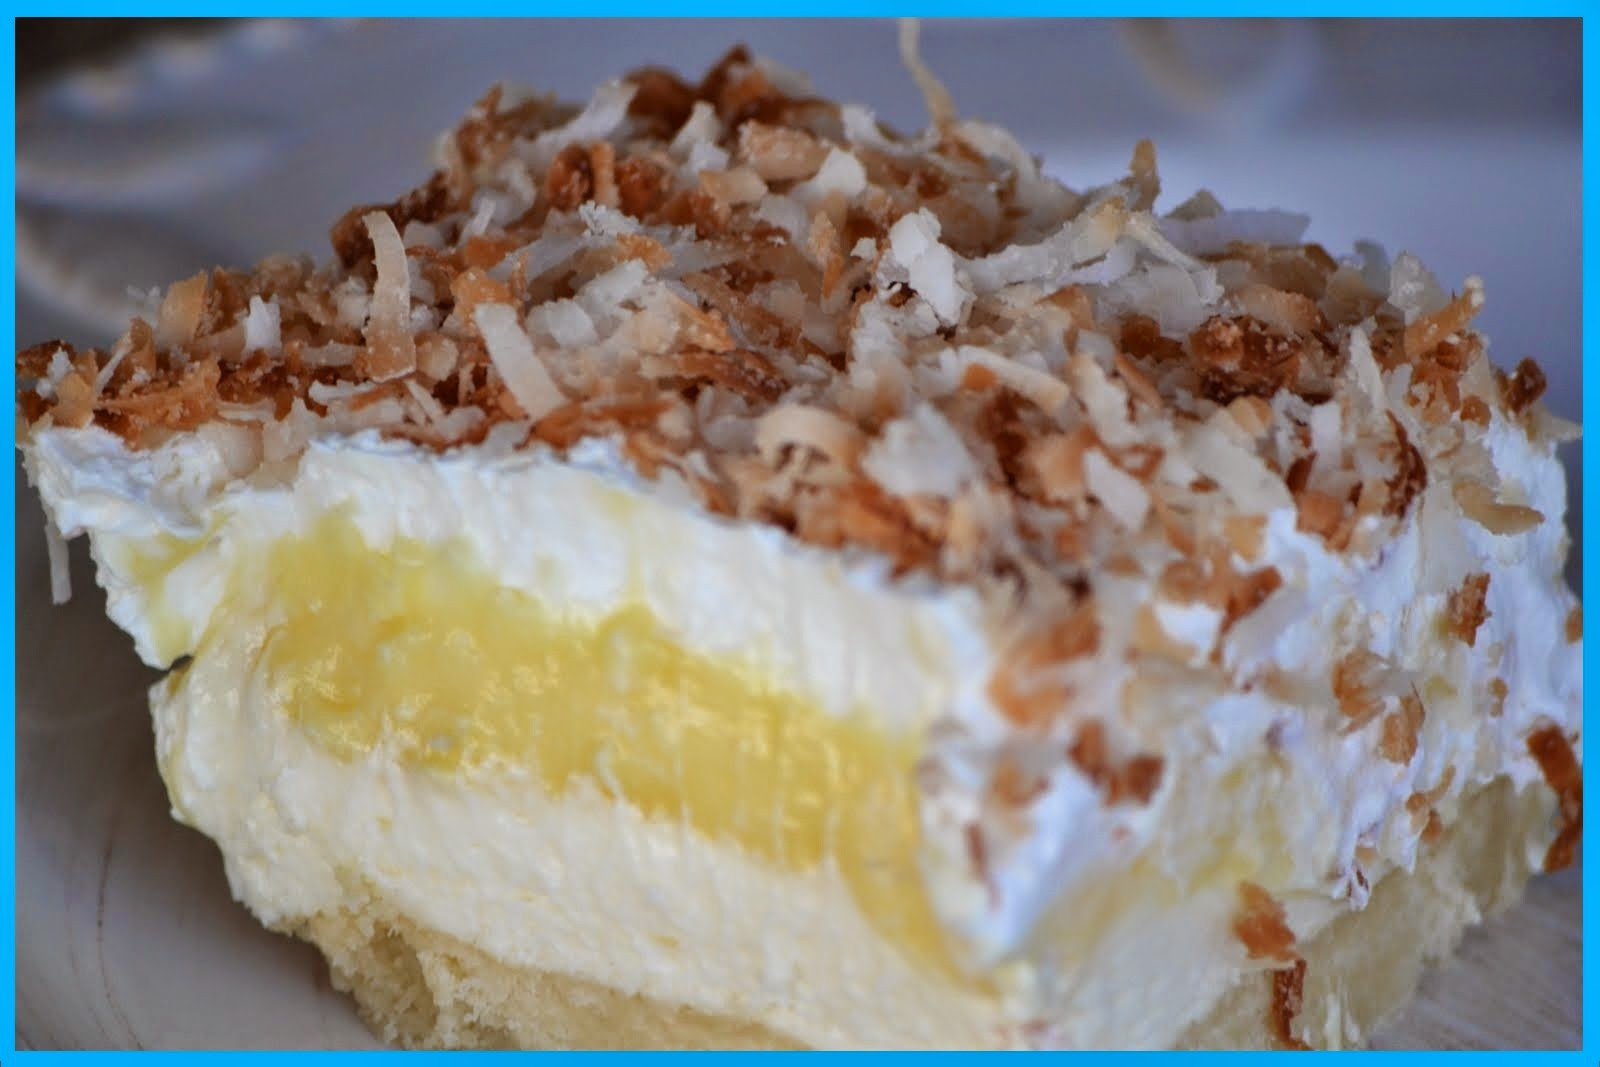 Best Coconut Cream Pie  Top Recipes all Time Princess Pie Coconut Cream Pie